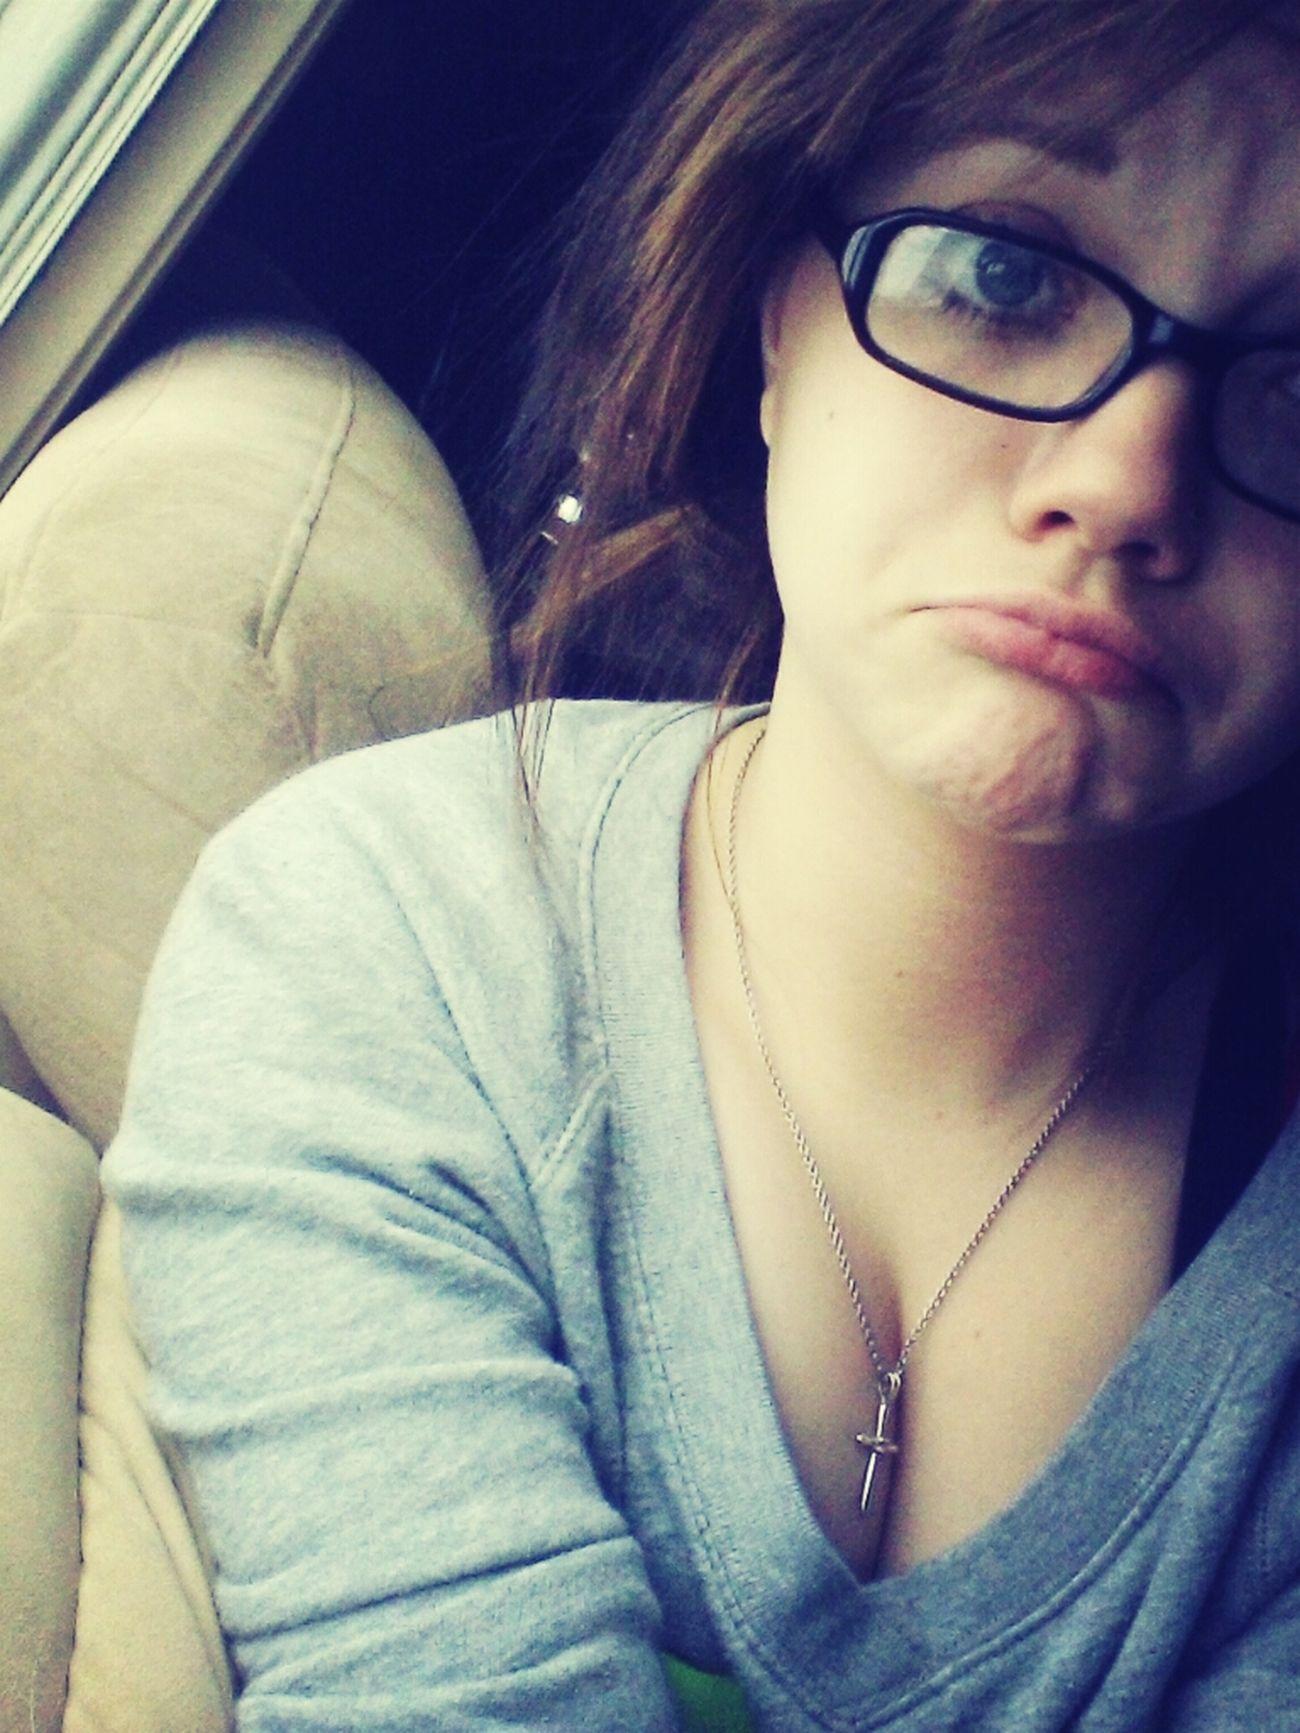 H8 Being Sick. 